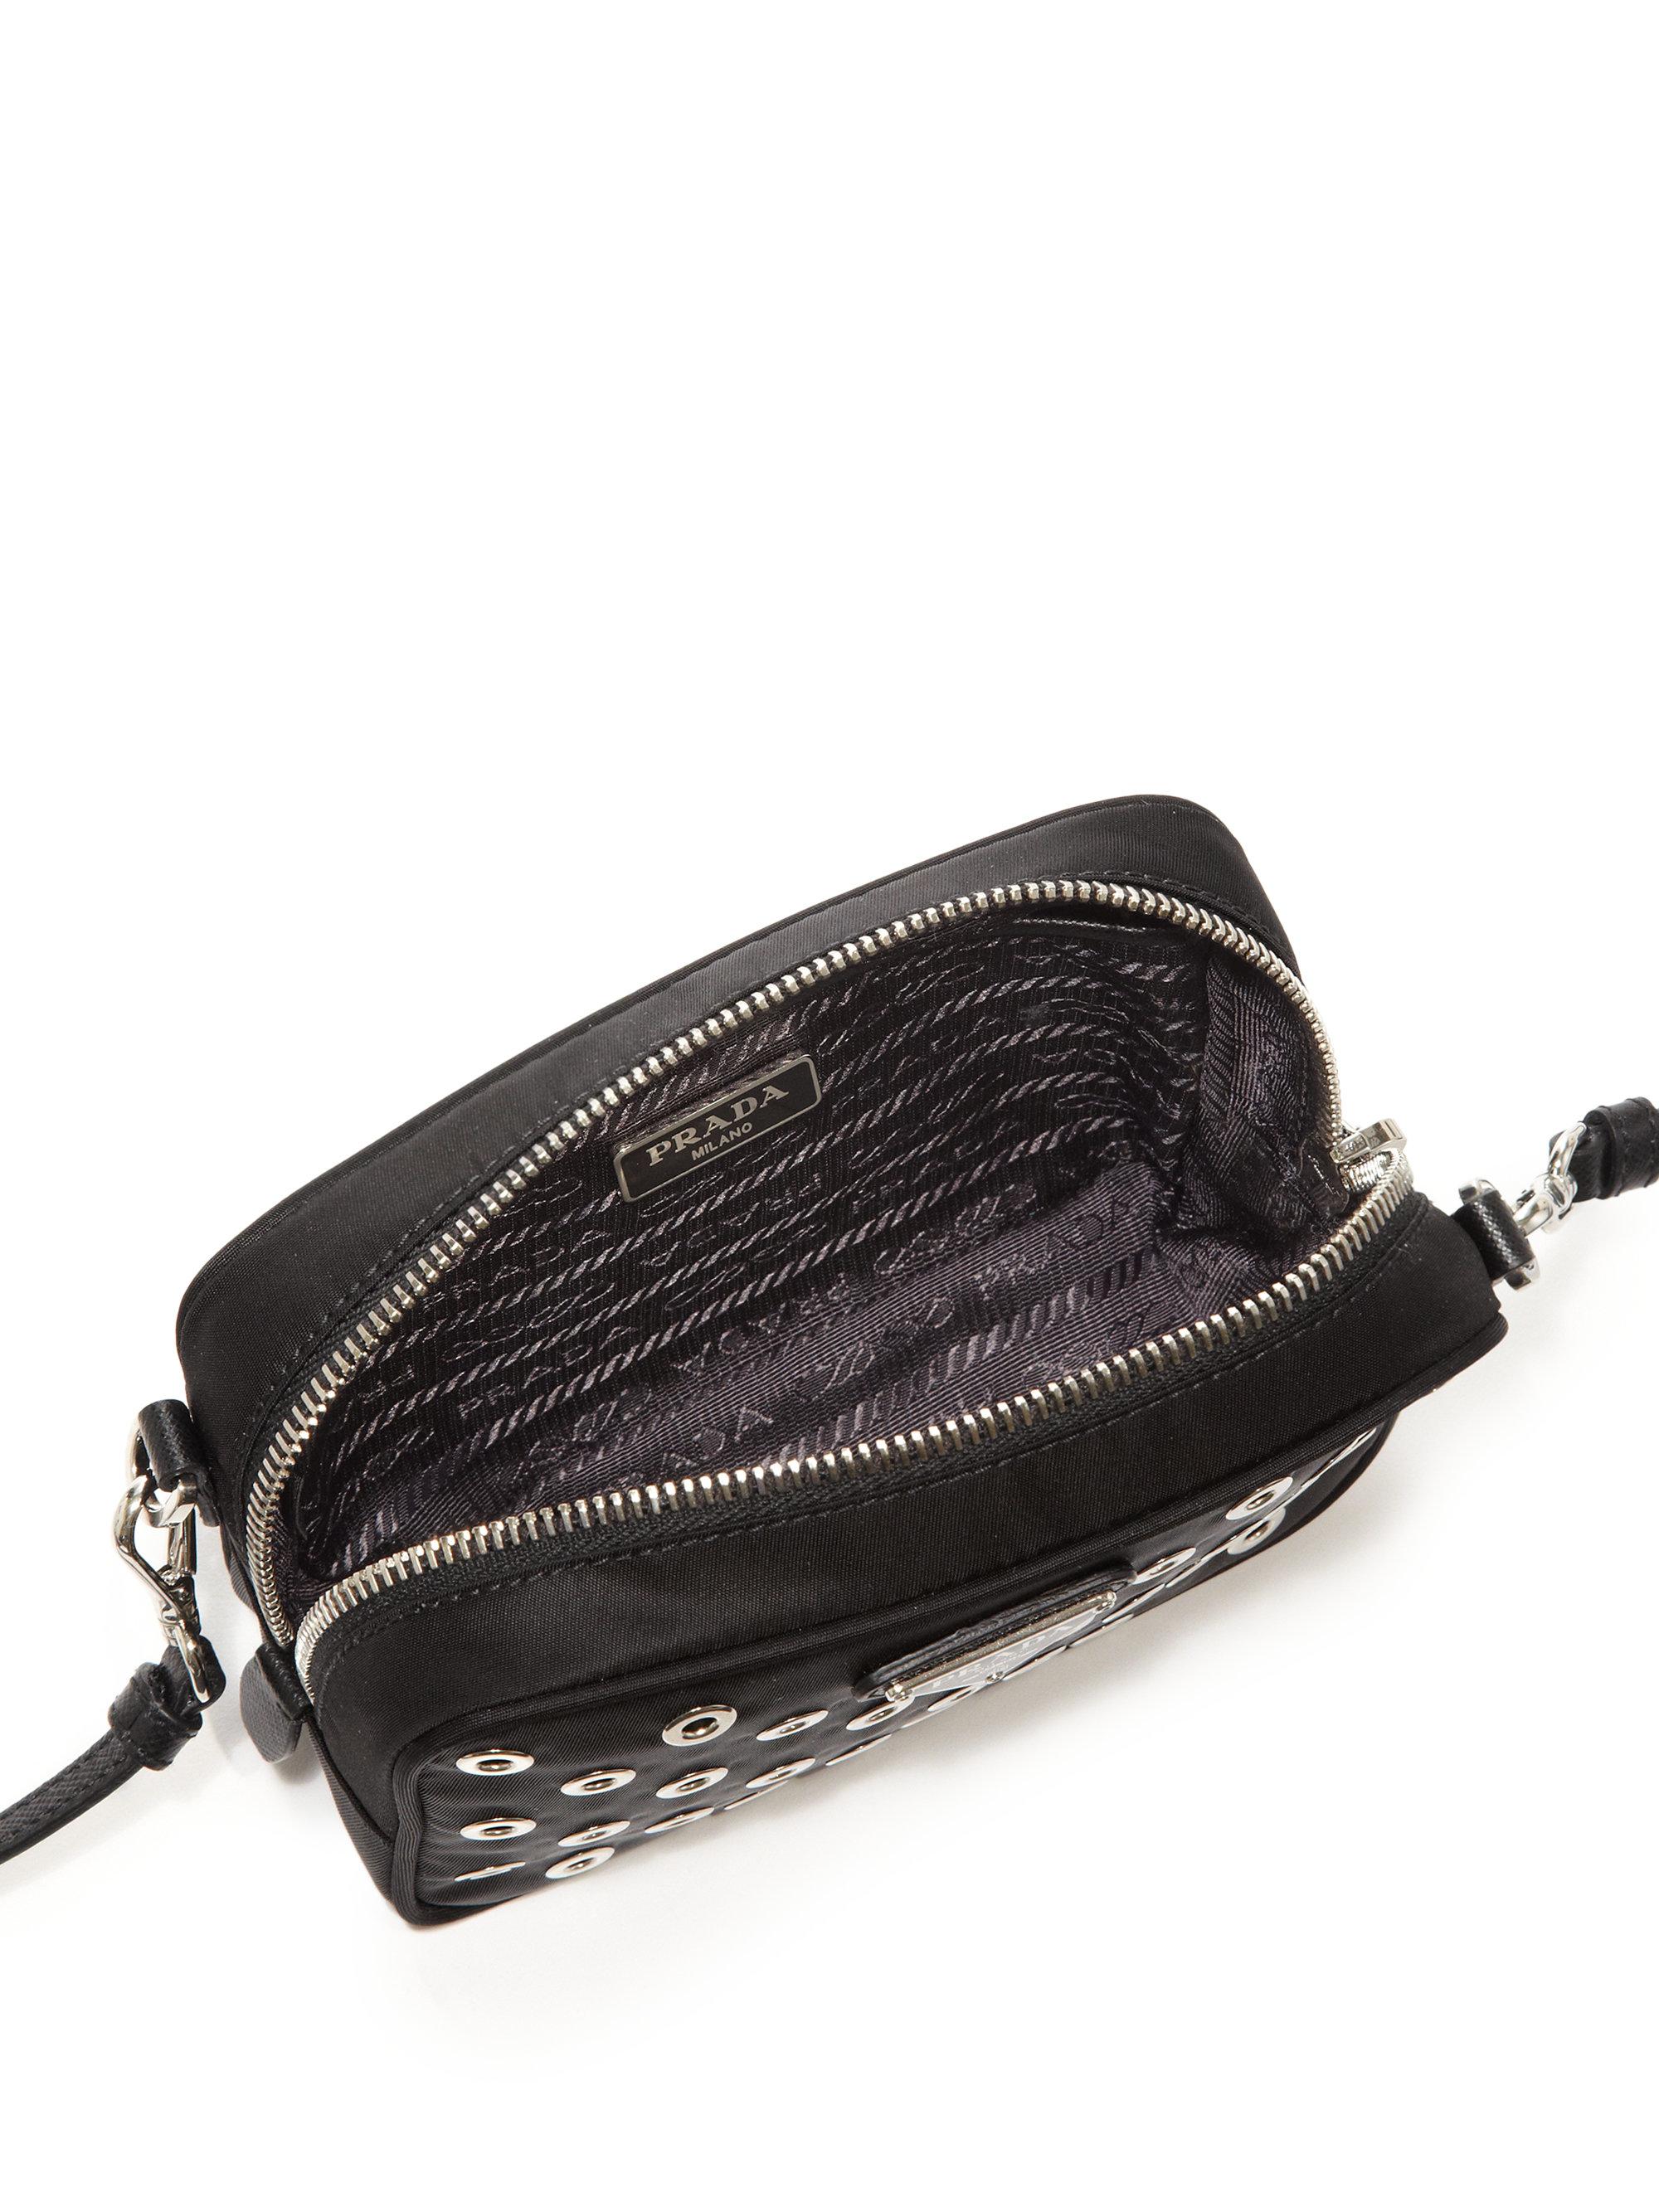 Prada Grommeted Nylon Camera Bag in Black | Lyst